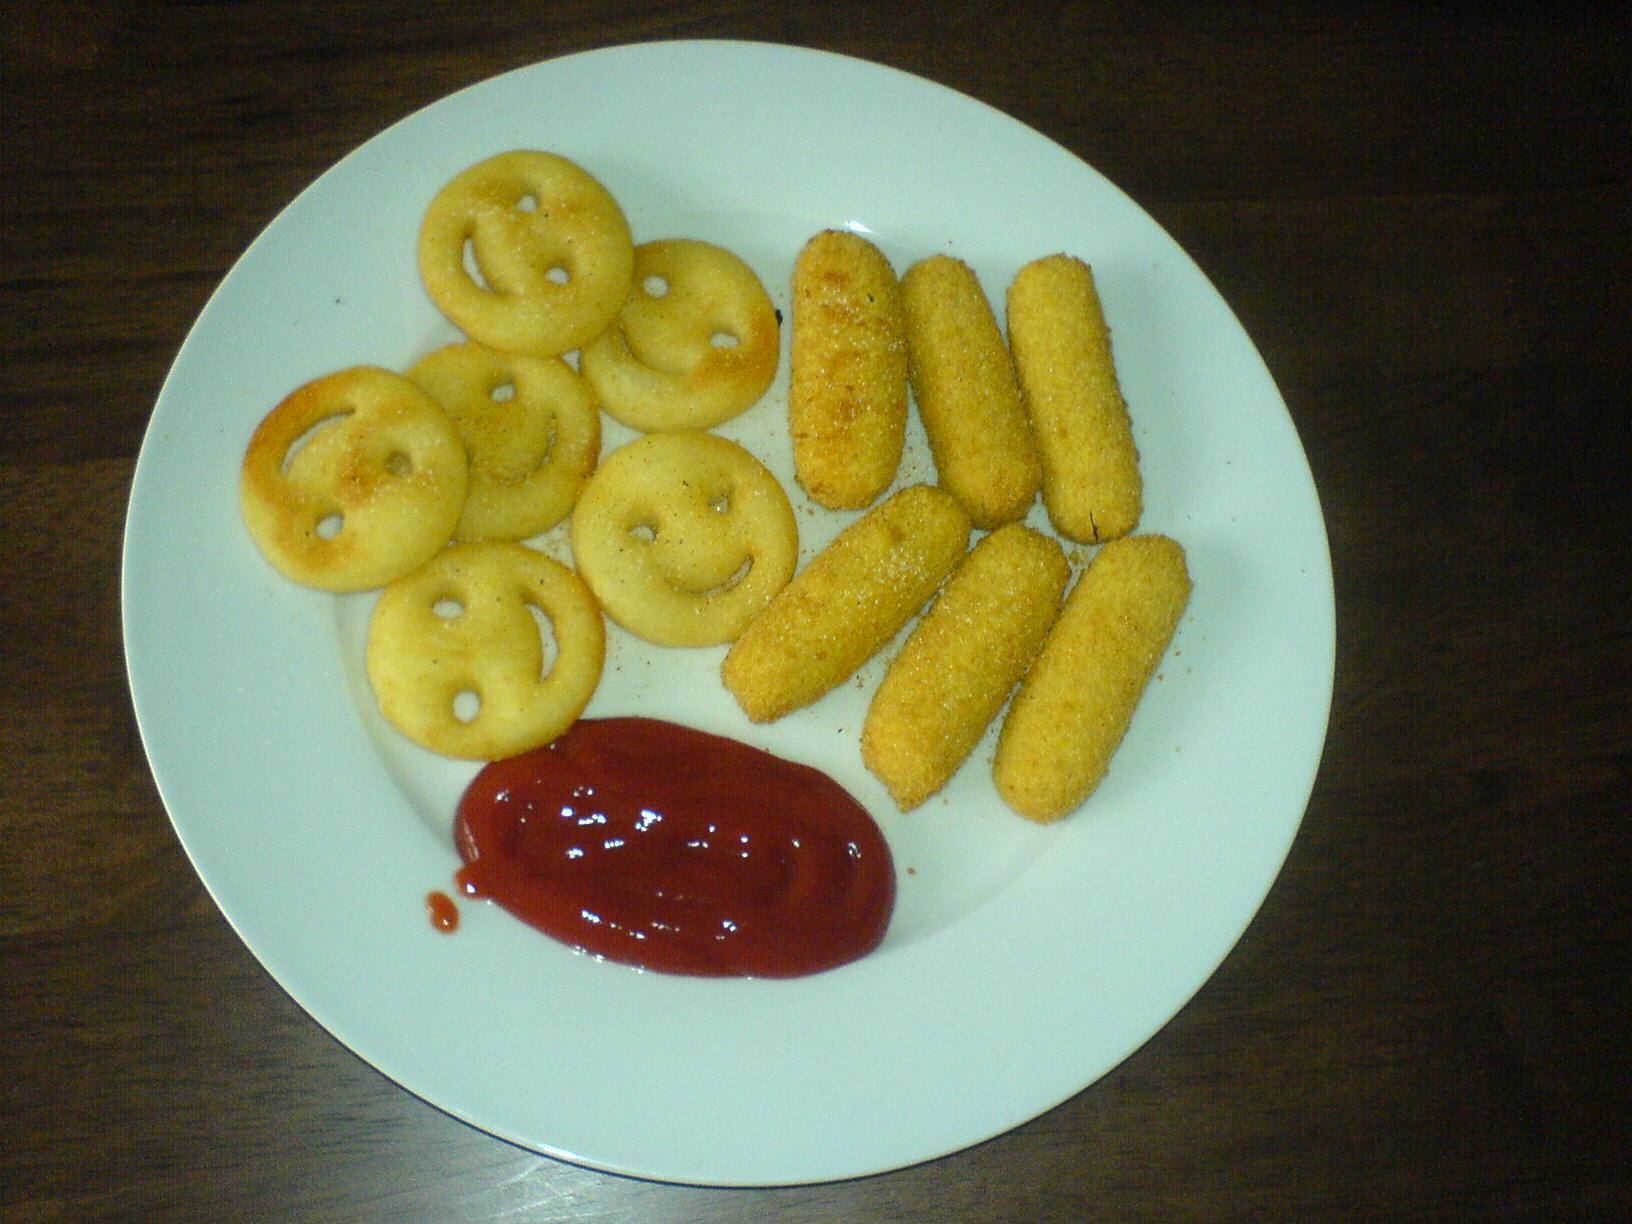 https://foodloader.net/Holz_2011-07-13_Frischkaesesticks_mit_Smiles.jpg